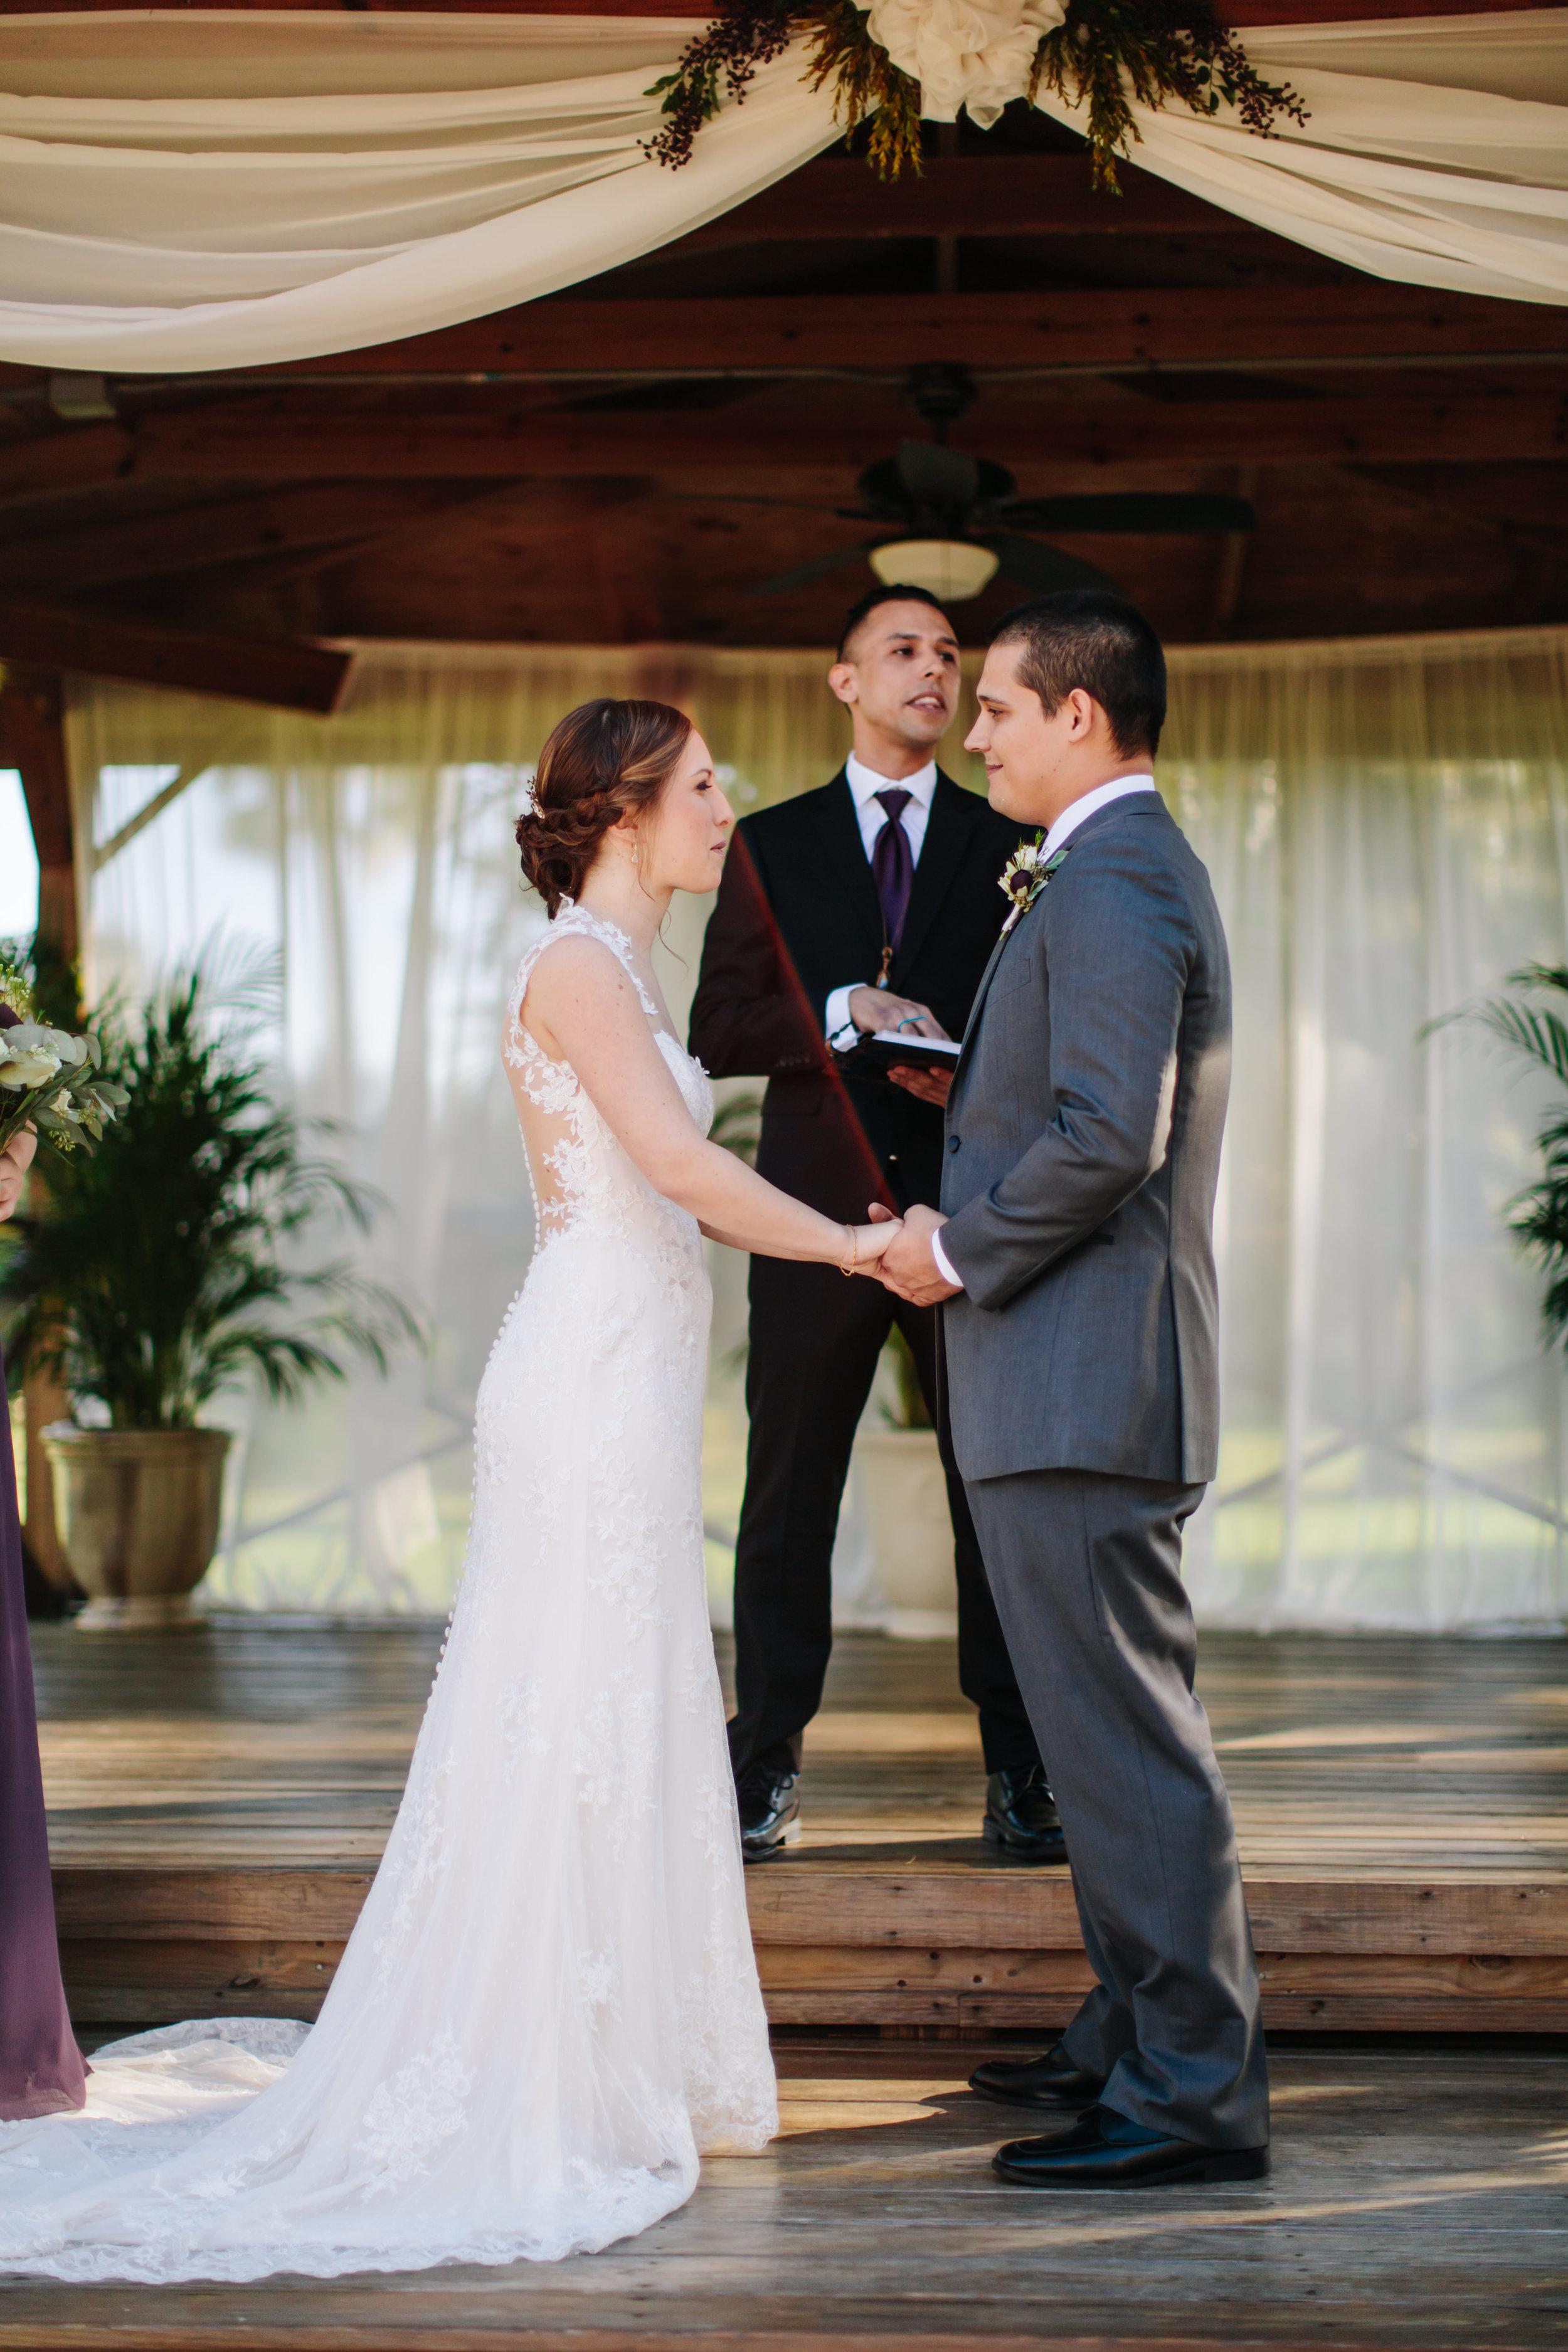 2018.02.17 Whitney and Joe Meyer Melbourne Wedding (258 of 759).jpg